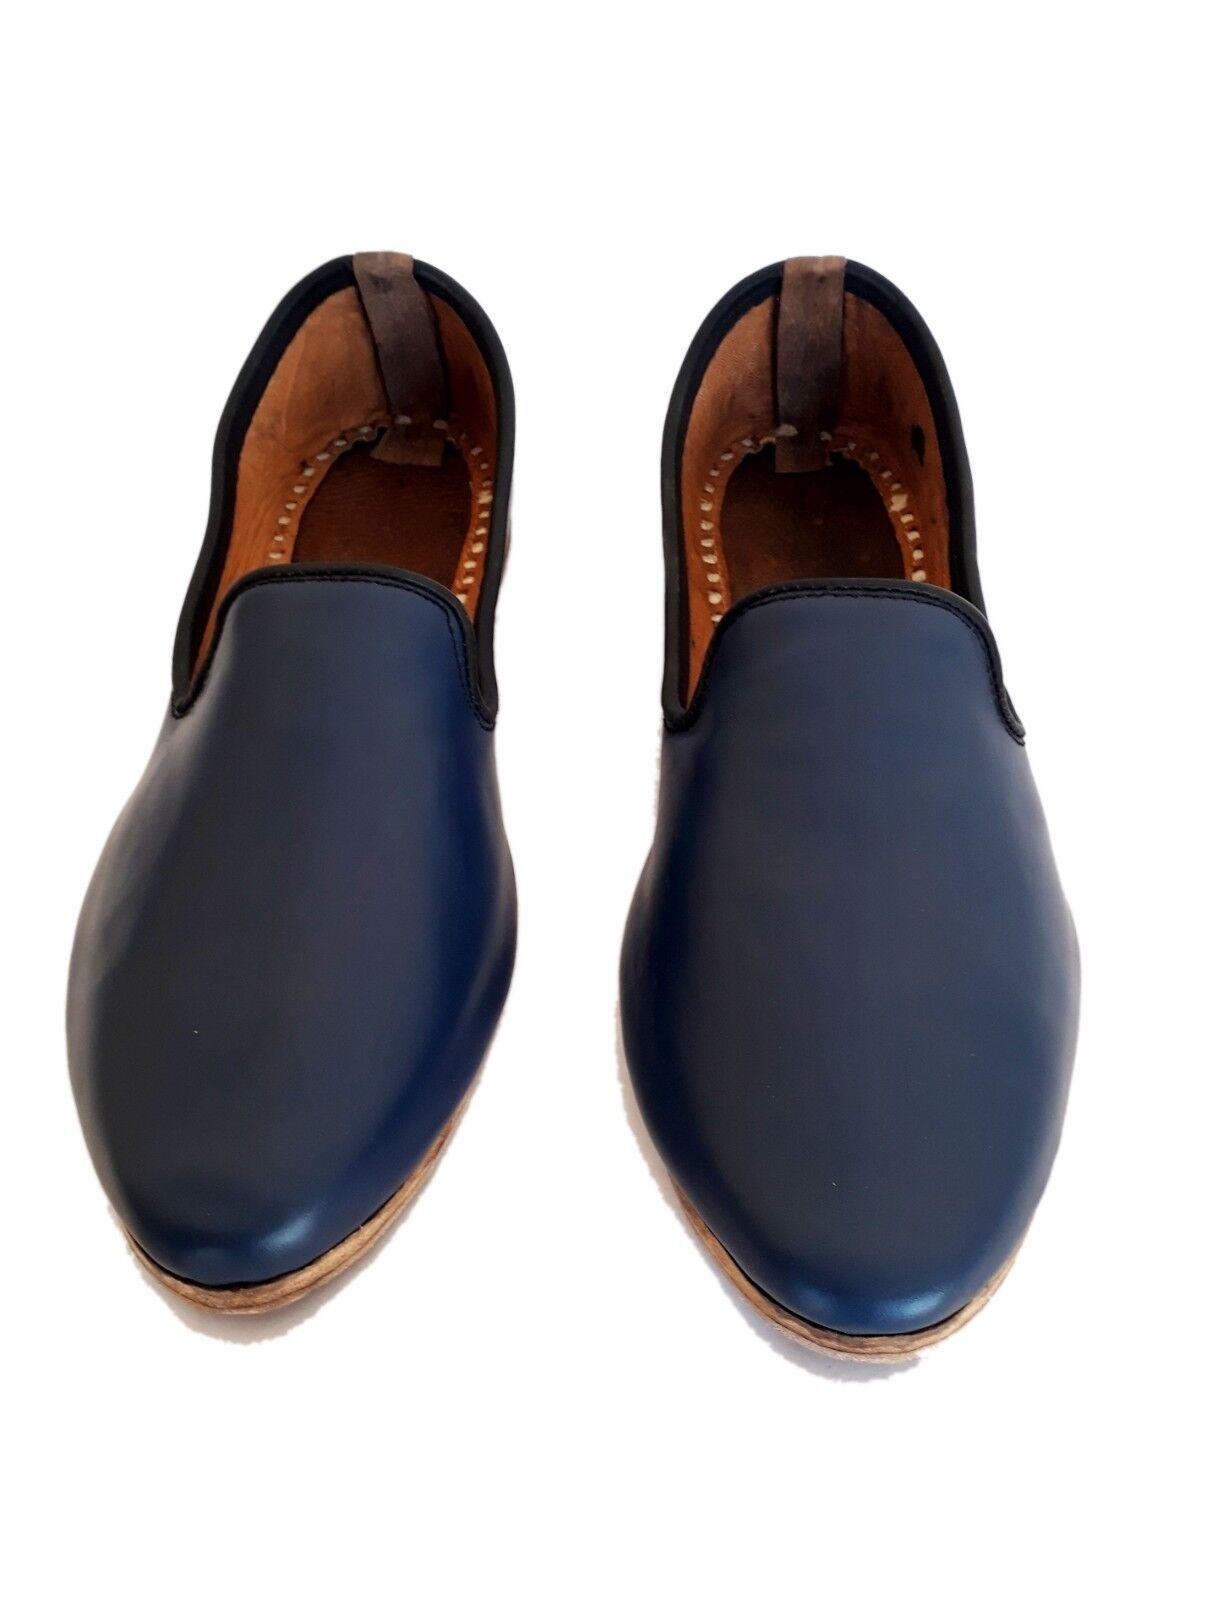 4d460ab4776e Blue mens leather shoes handmade shoes vintage shoes shoes shoes leather  jutti mens sandals 4641ac